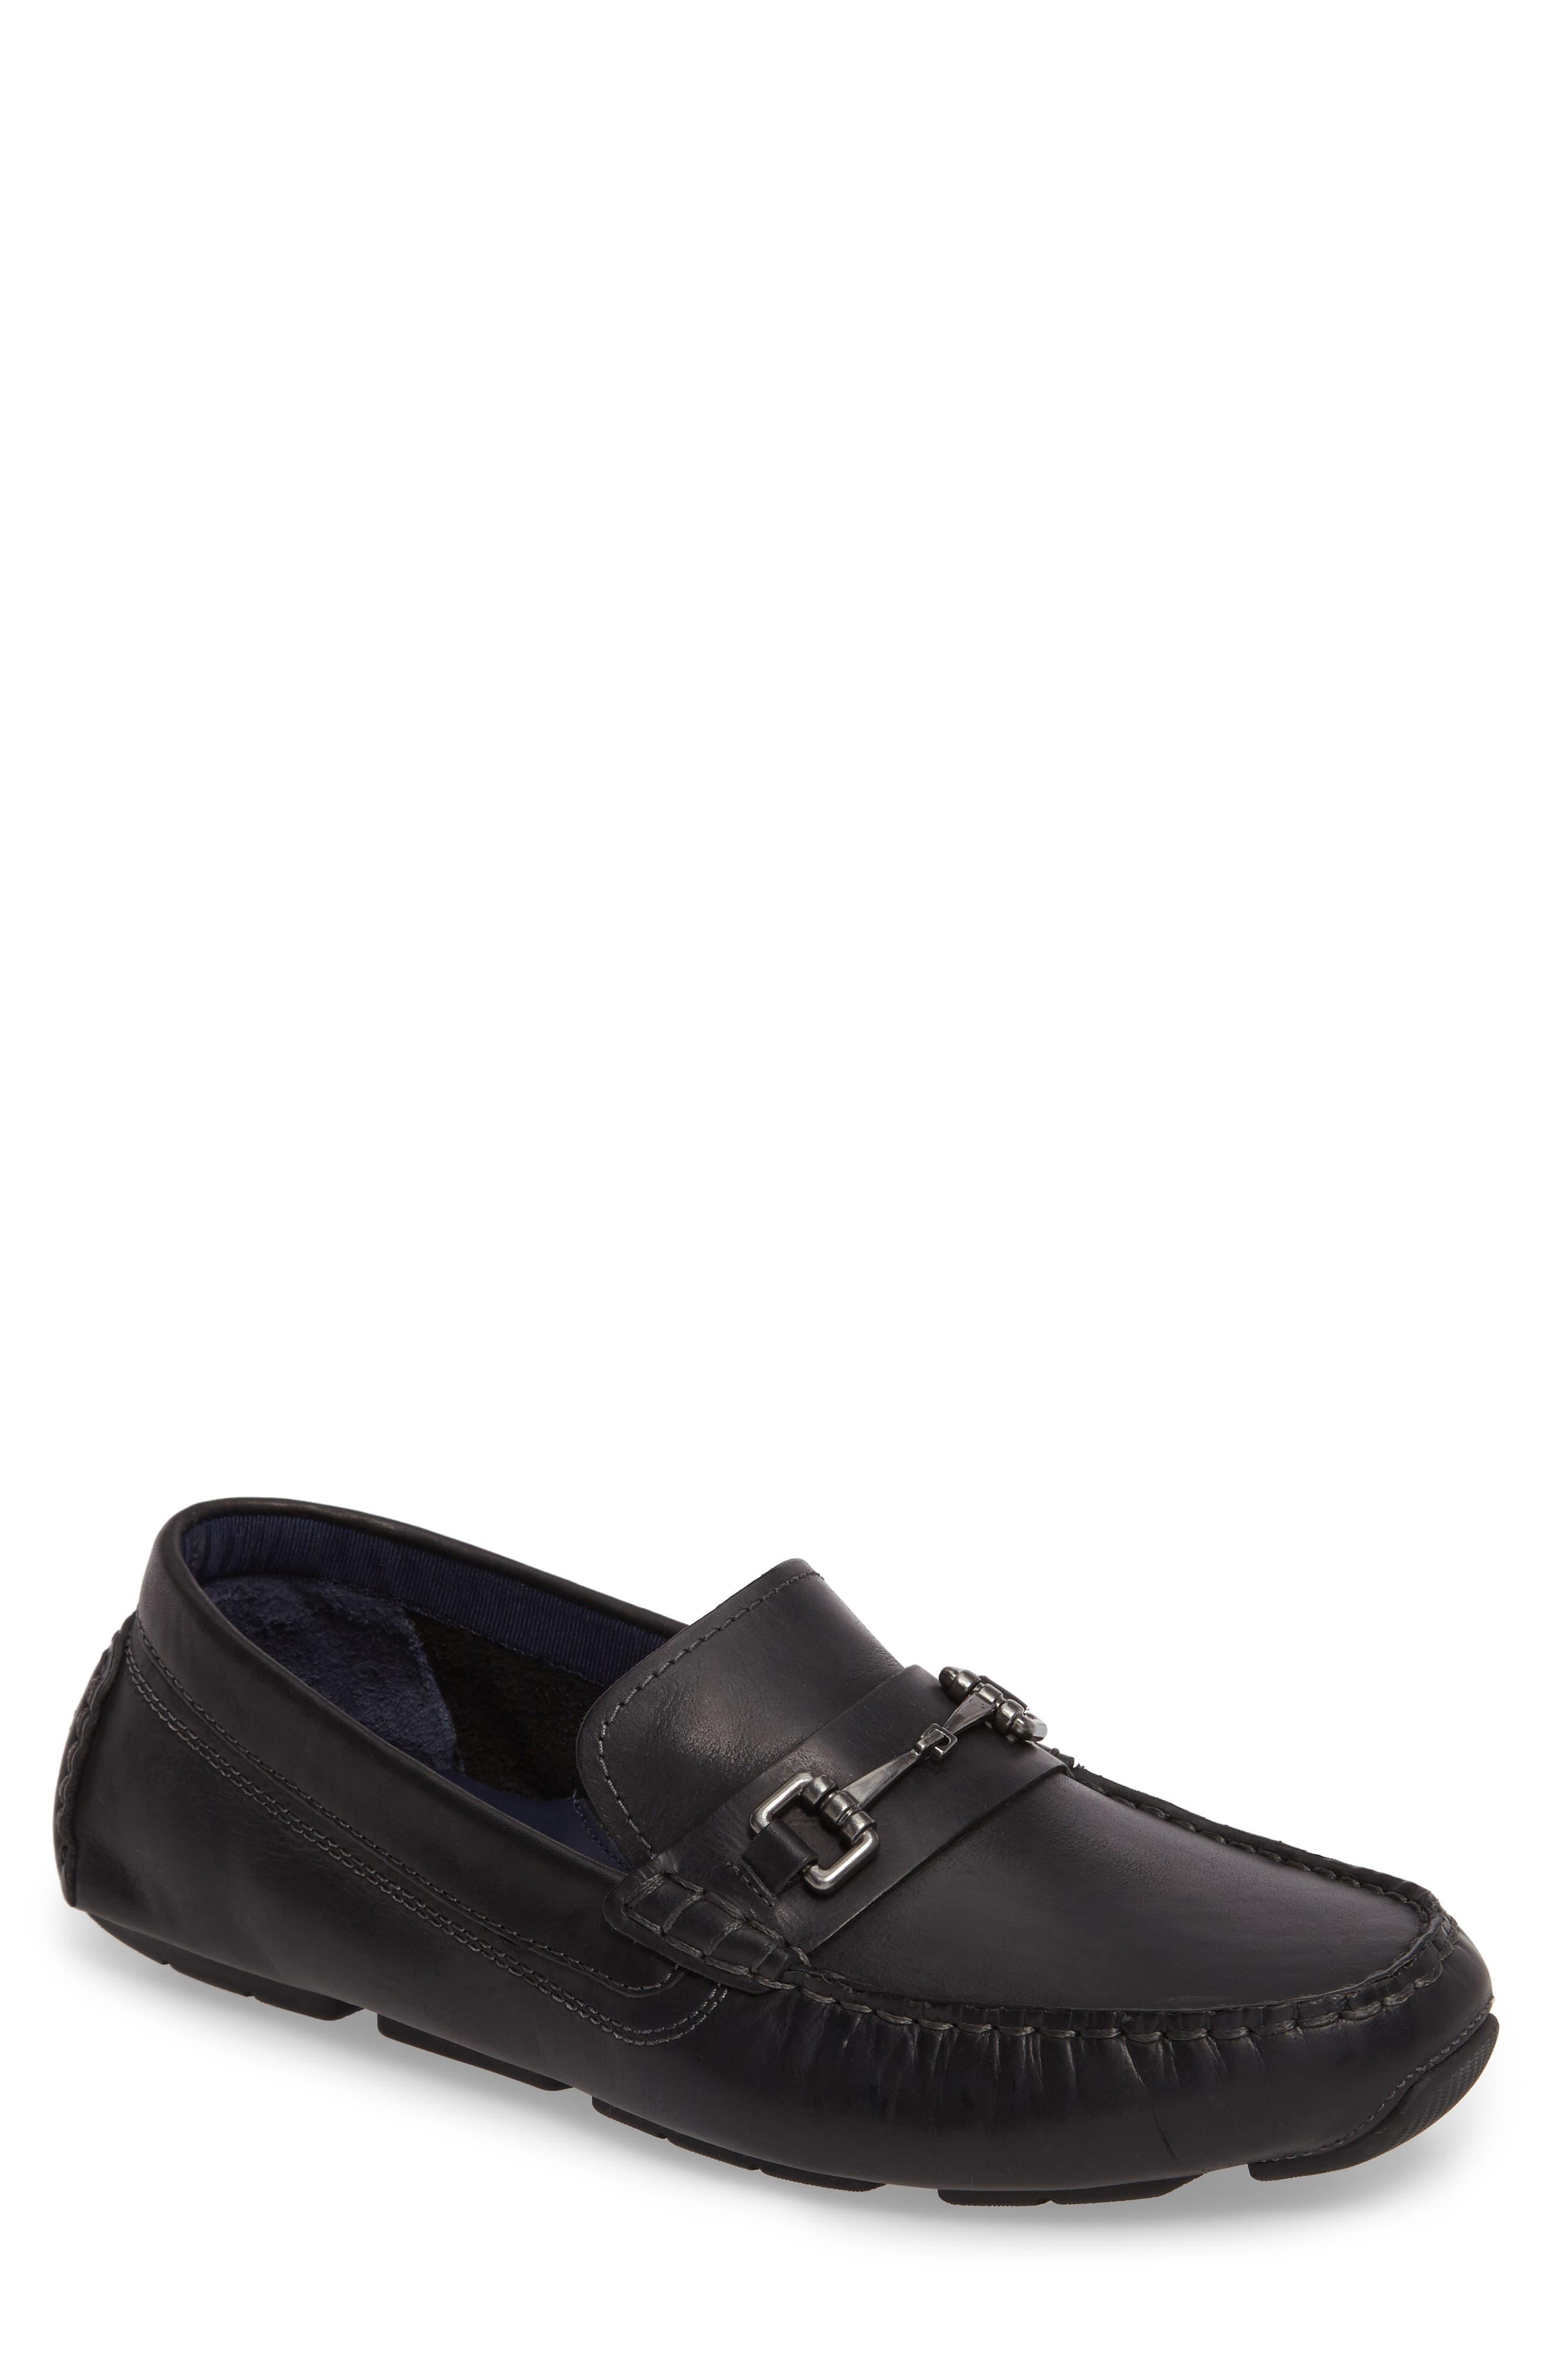 Kelson Bit Driving Shoe,                         Main,                         color, Black Leather